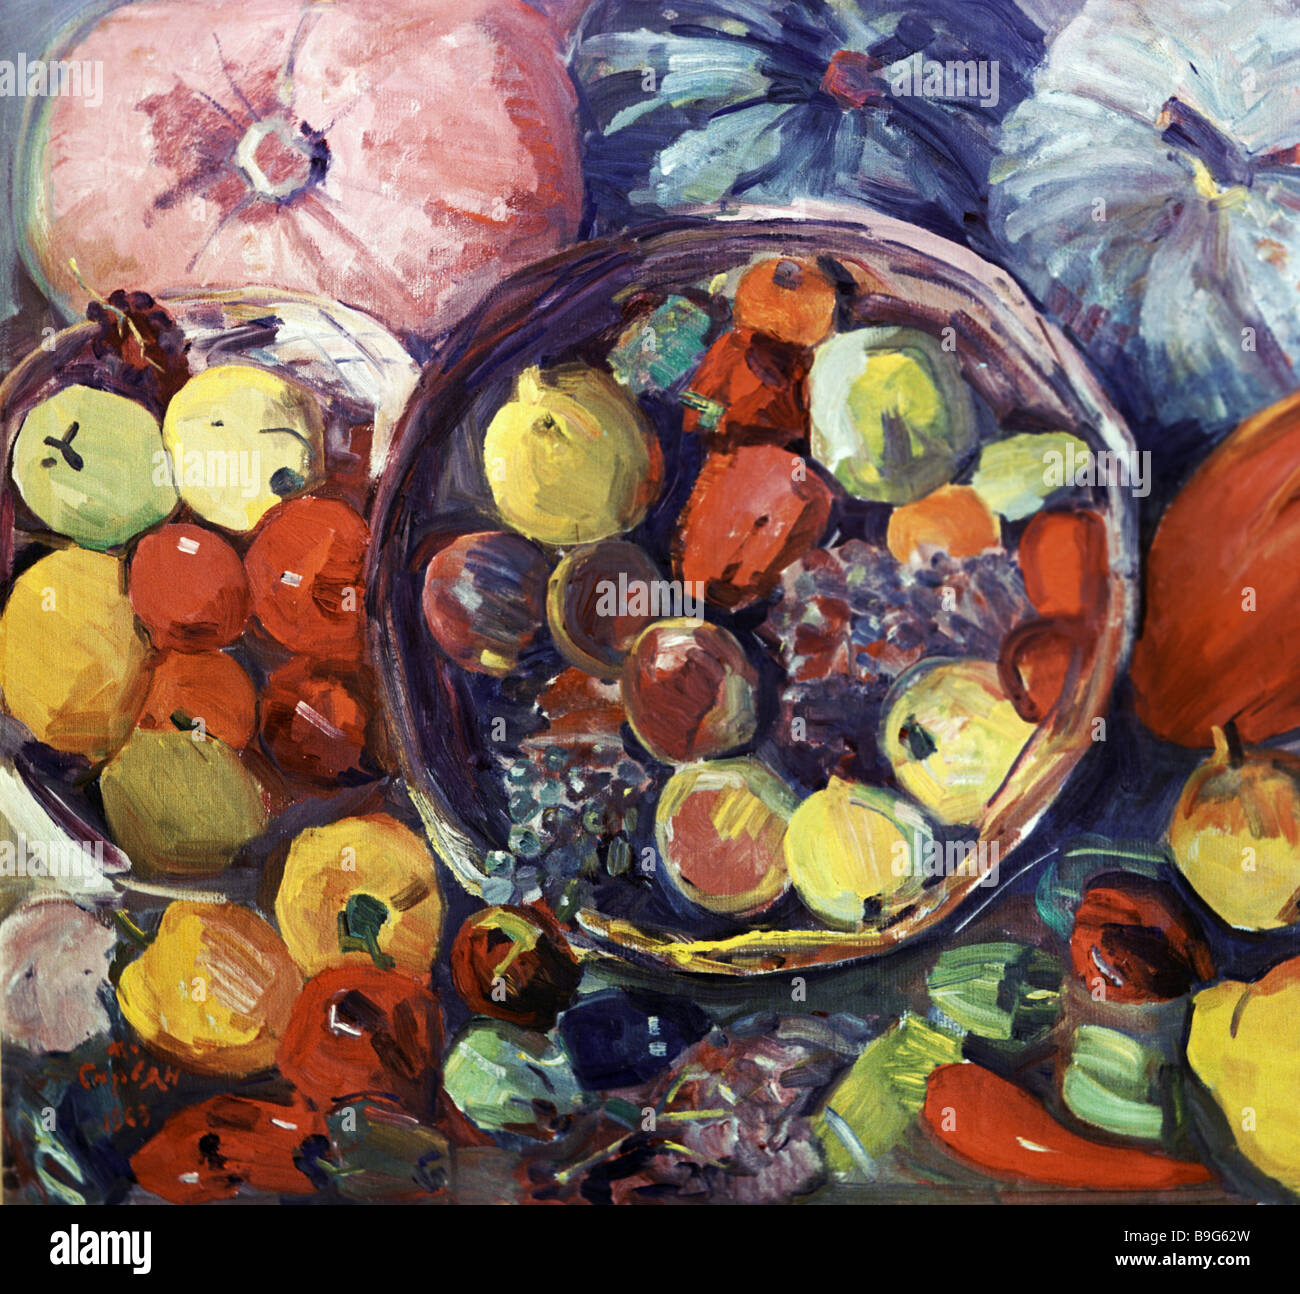 Reproduction of Martiros Saryan s painting Autumn still life from the Martiros Saryan museum in Yerevan - Stock Image